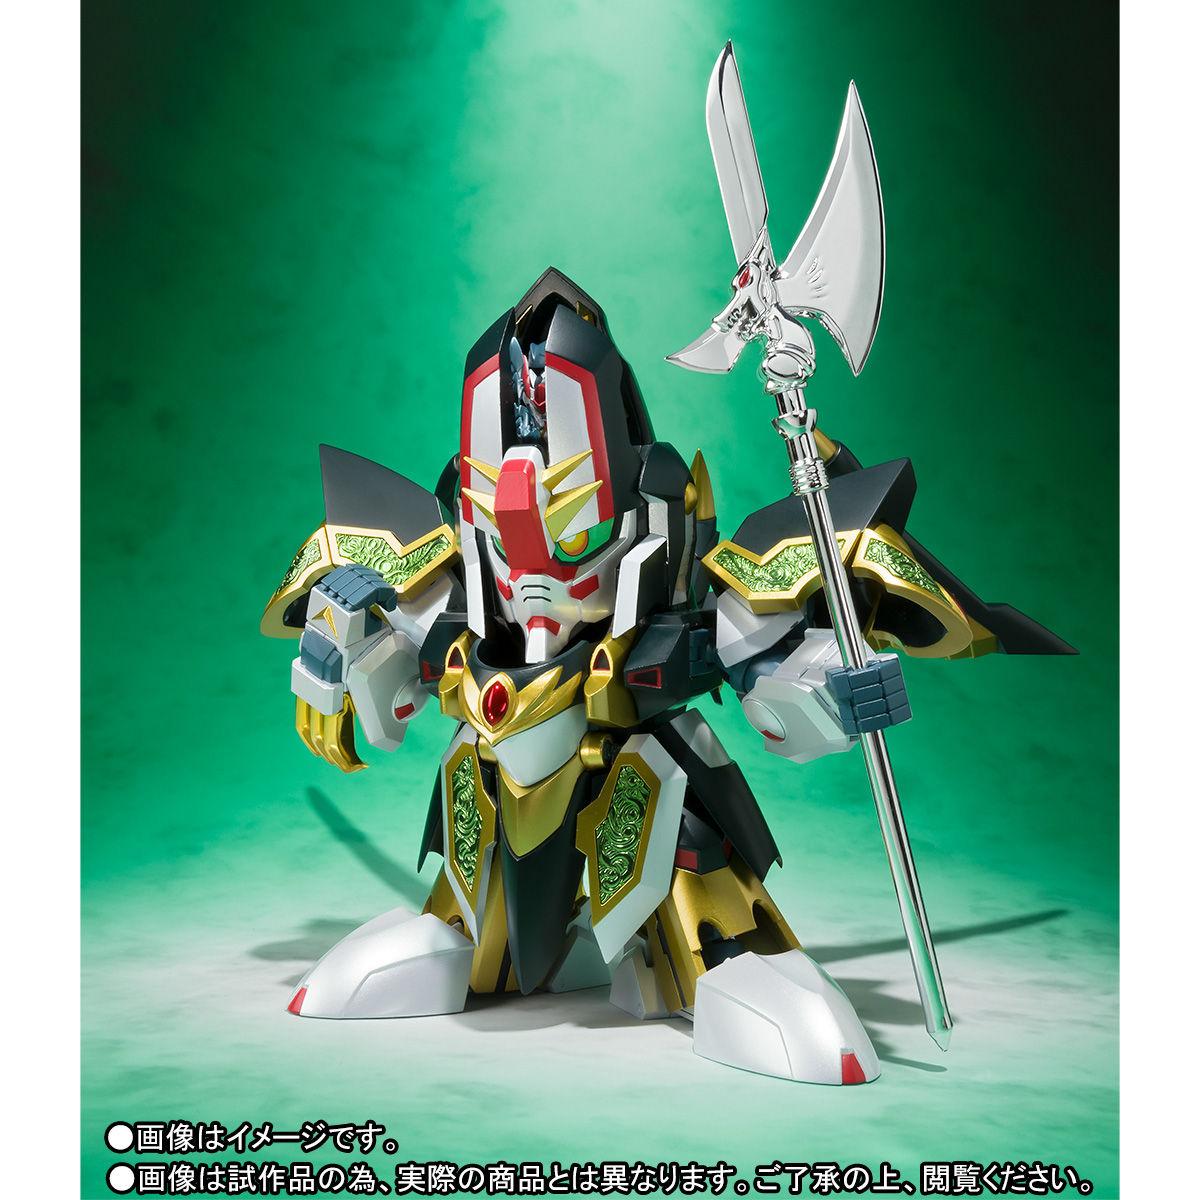 SDX『龍機ドラグーン 新SDガンダム外伝』可変可動フィギュア-005